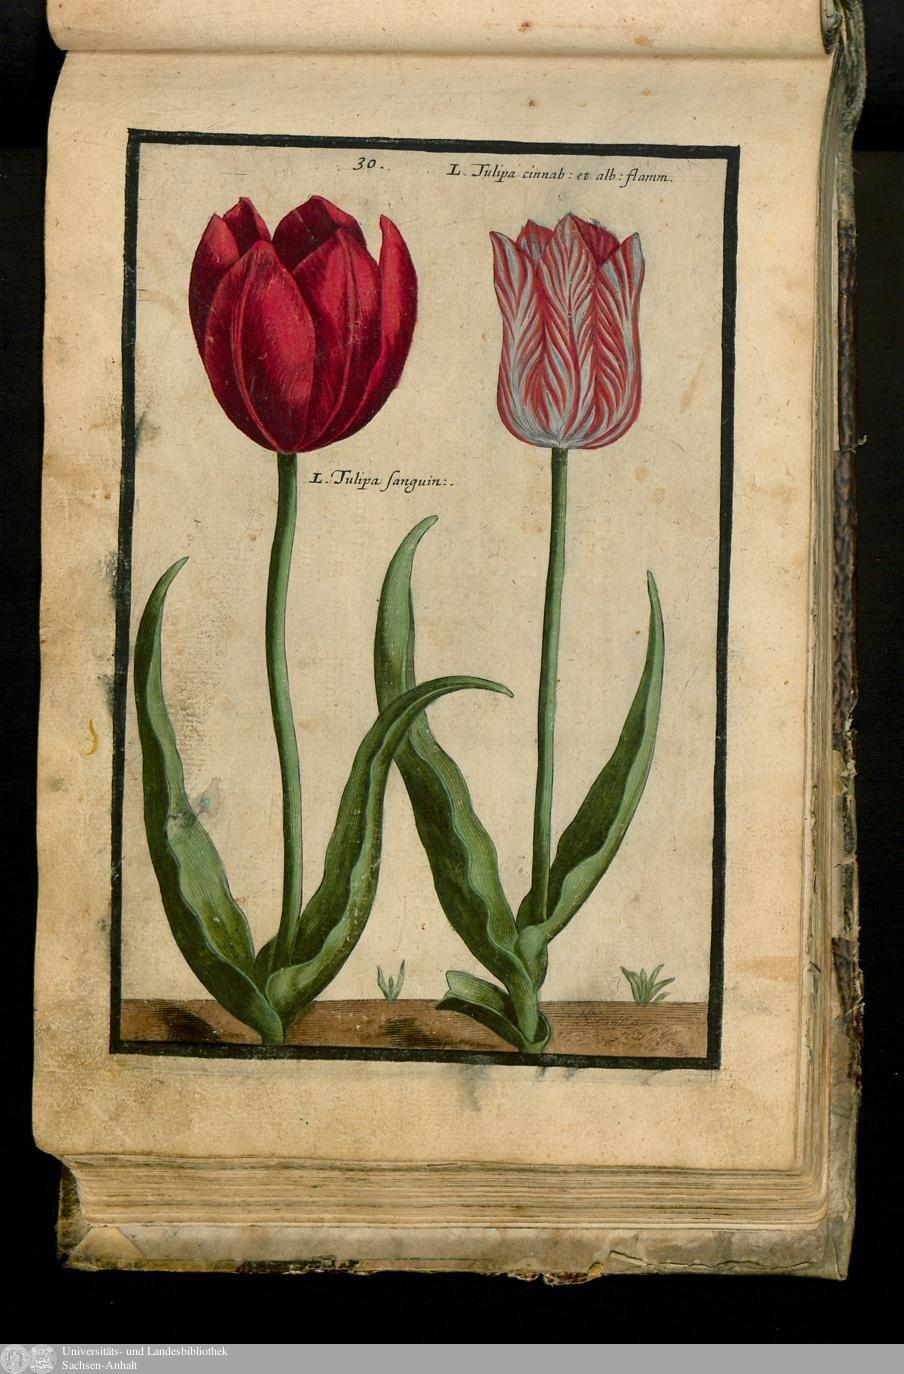 47 - XXX. Tulipa Latifol. Flore Sanguineneo. Flore Miniato Flamcandican Vario. - Seite - Inhouse-Digitalisierung